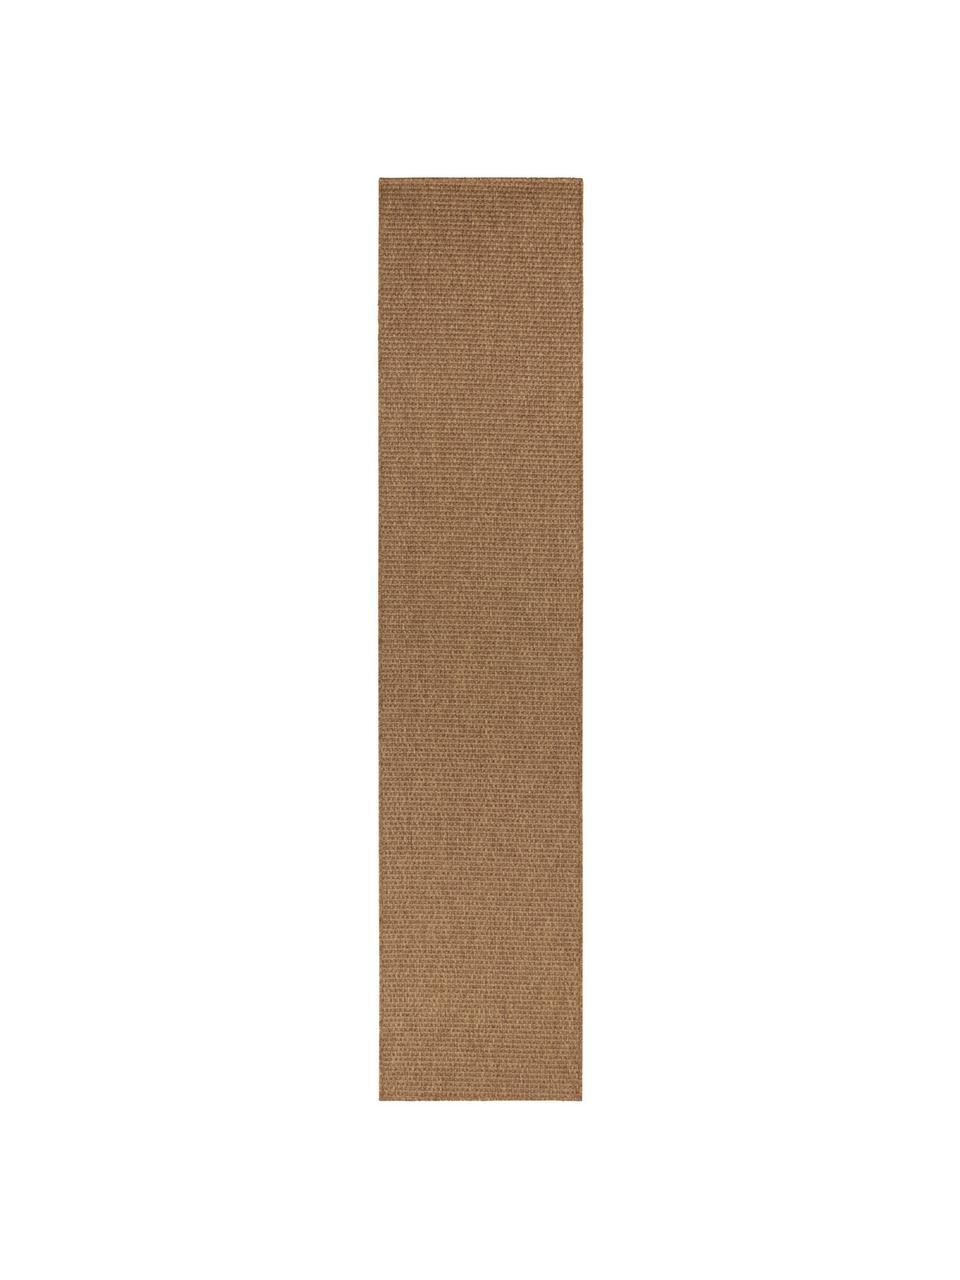 In- & Outdoor-Läufer Nala in Sisal-Optik, 100% Polypropylen, Braun, 80 x 500 cm